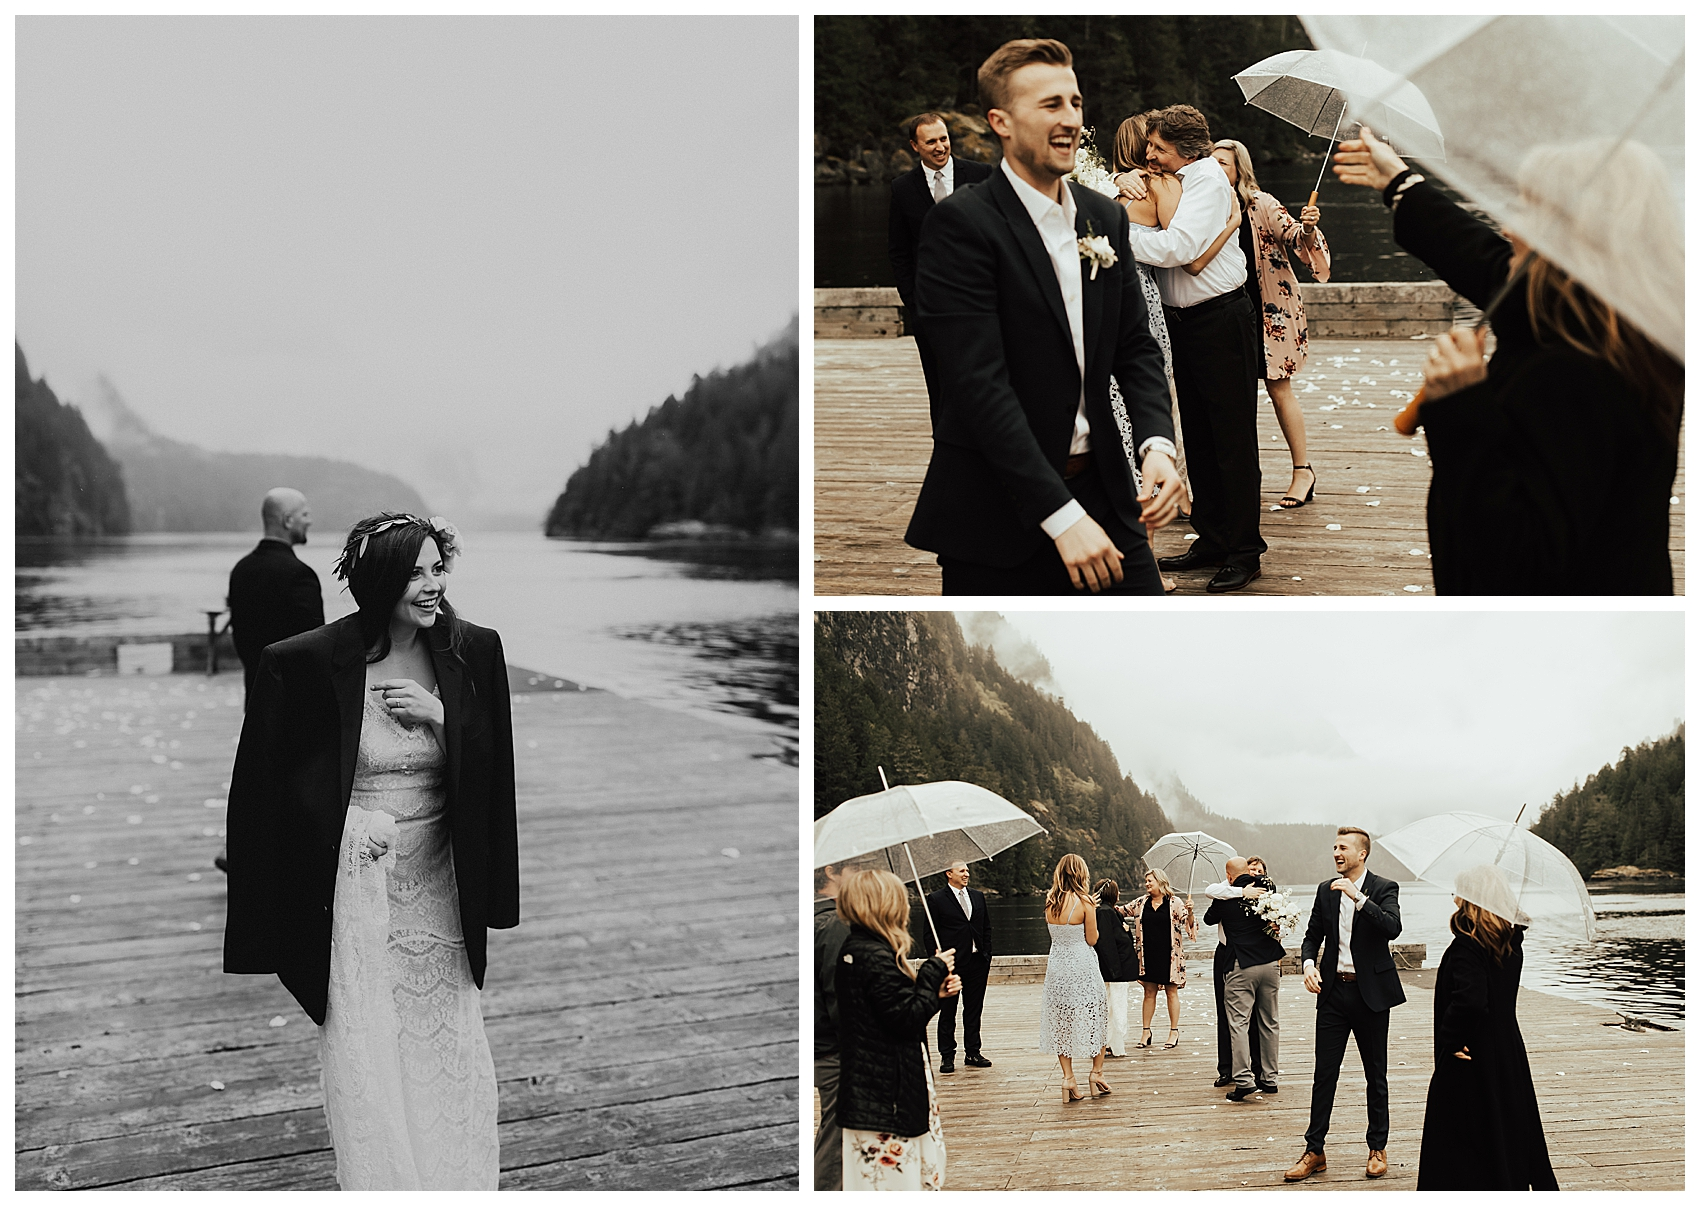 Seattle Wedding Photographer Cassie Trottier Photography